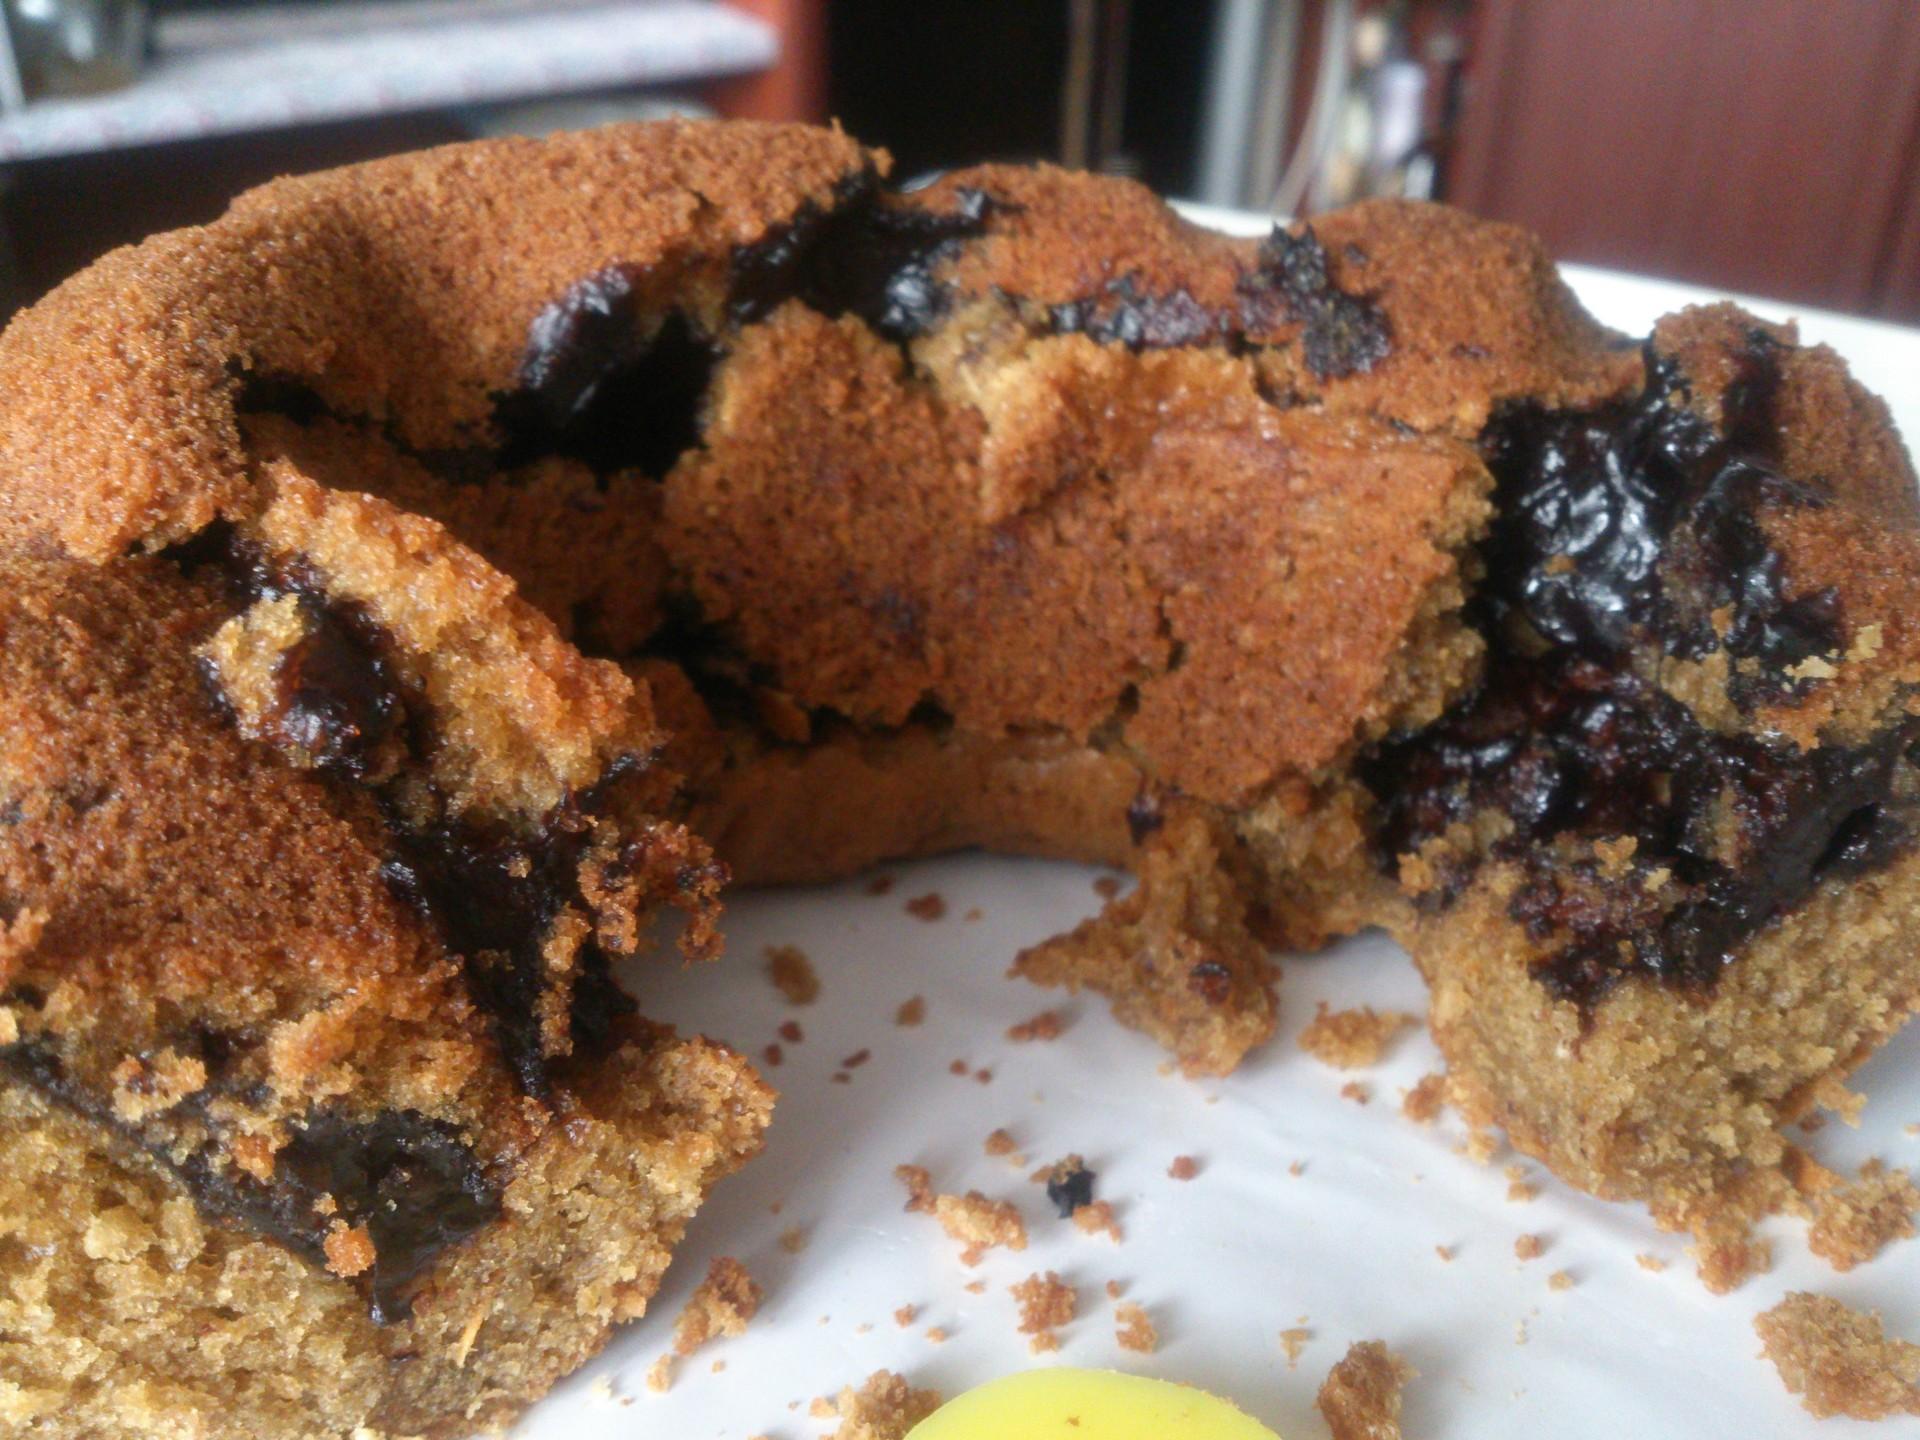 oatmeal-pound-cake-fish-c8c189d705869b02